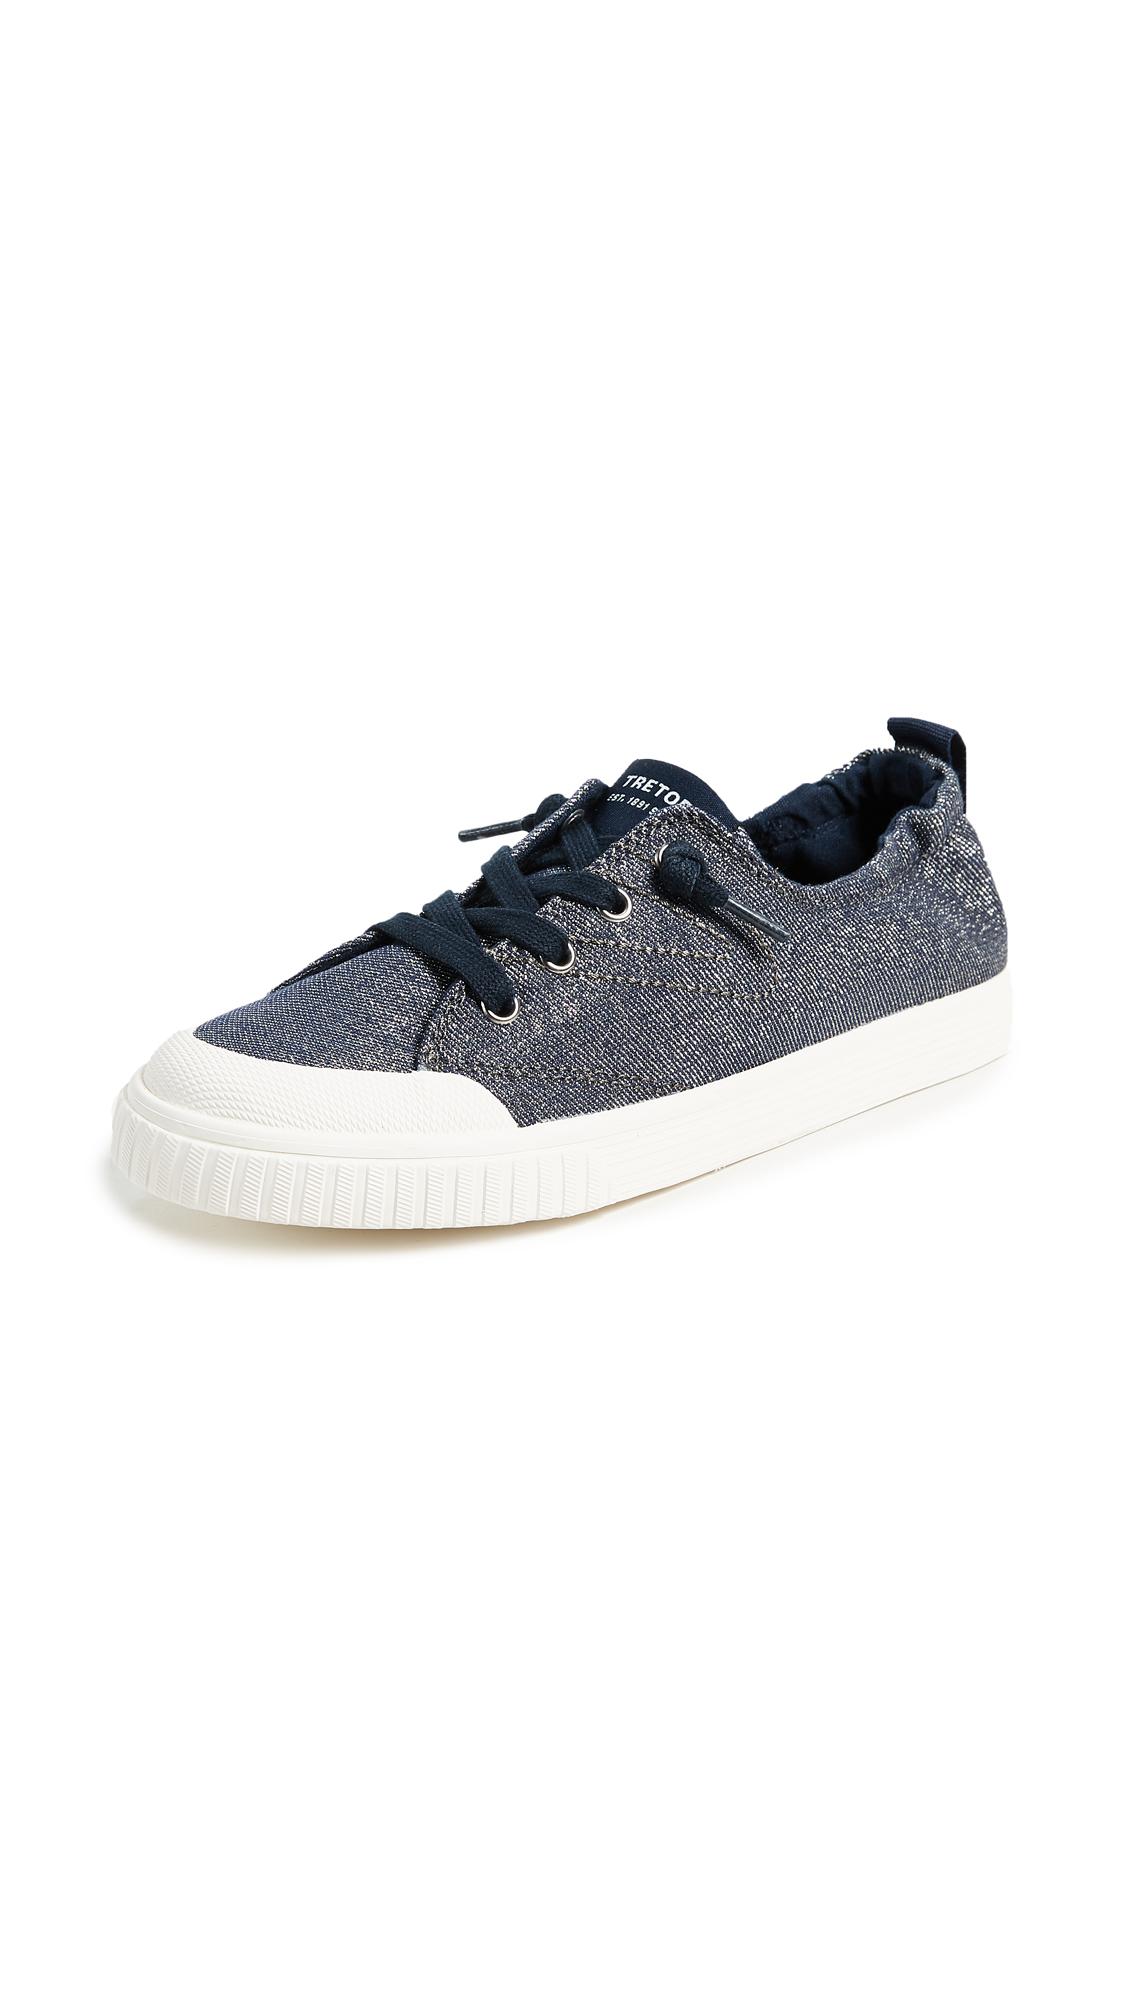 Tretorn Meg Laceup Sneakers - Dark Blue